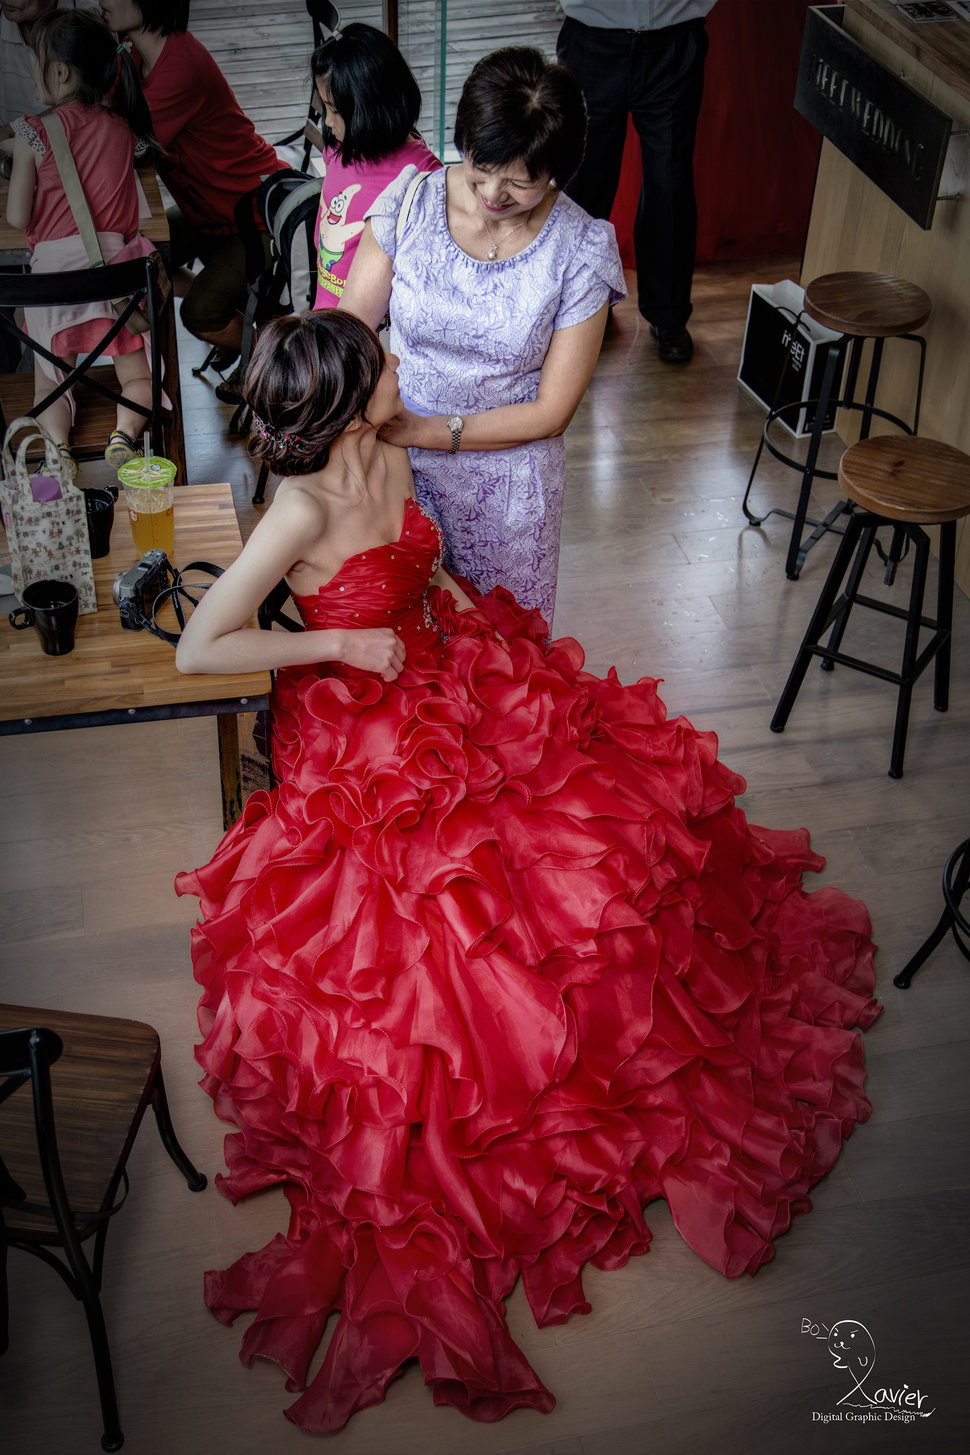 婚攝蛋  (Xavier Lee ) Collection(編號:227989) - XavierLee  蛋攝影像工作室 - 結婚吧